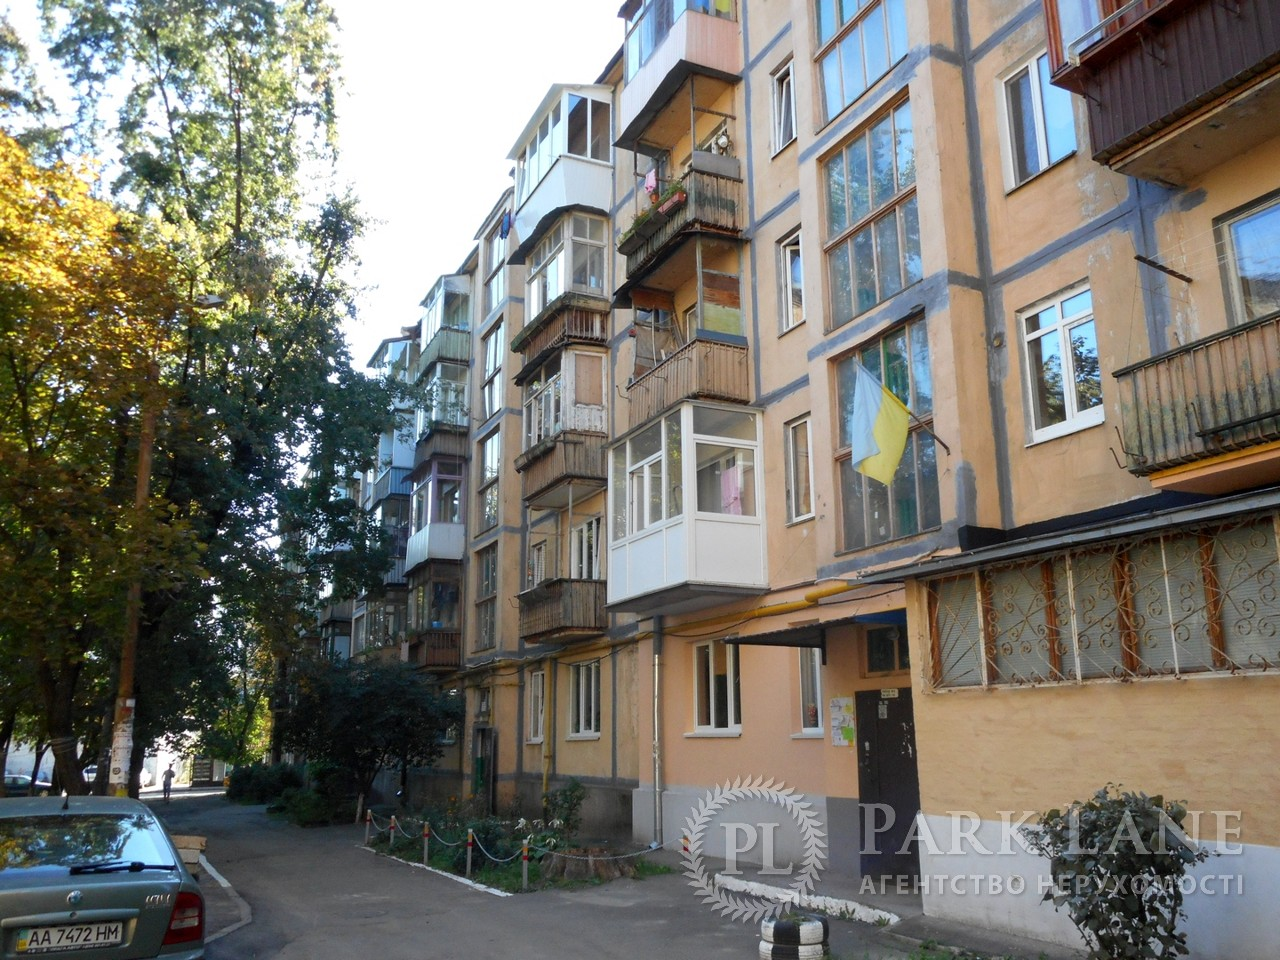 Квартира ул. Краснодарская, 47/1, Киев, Z-1002765 - Фото 2